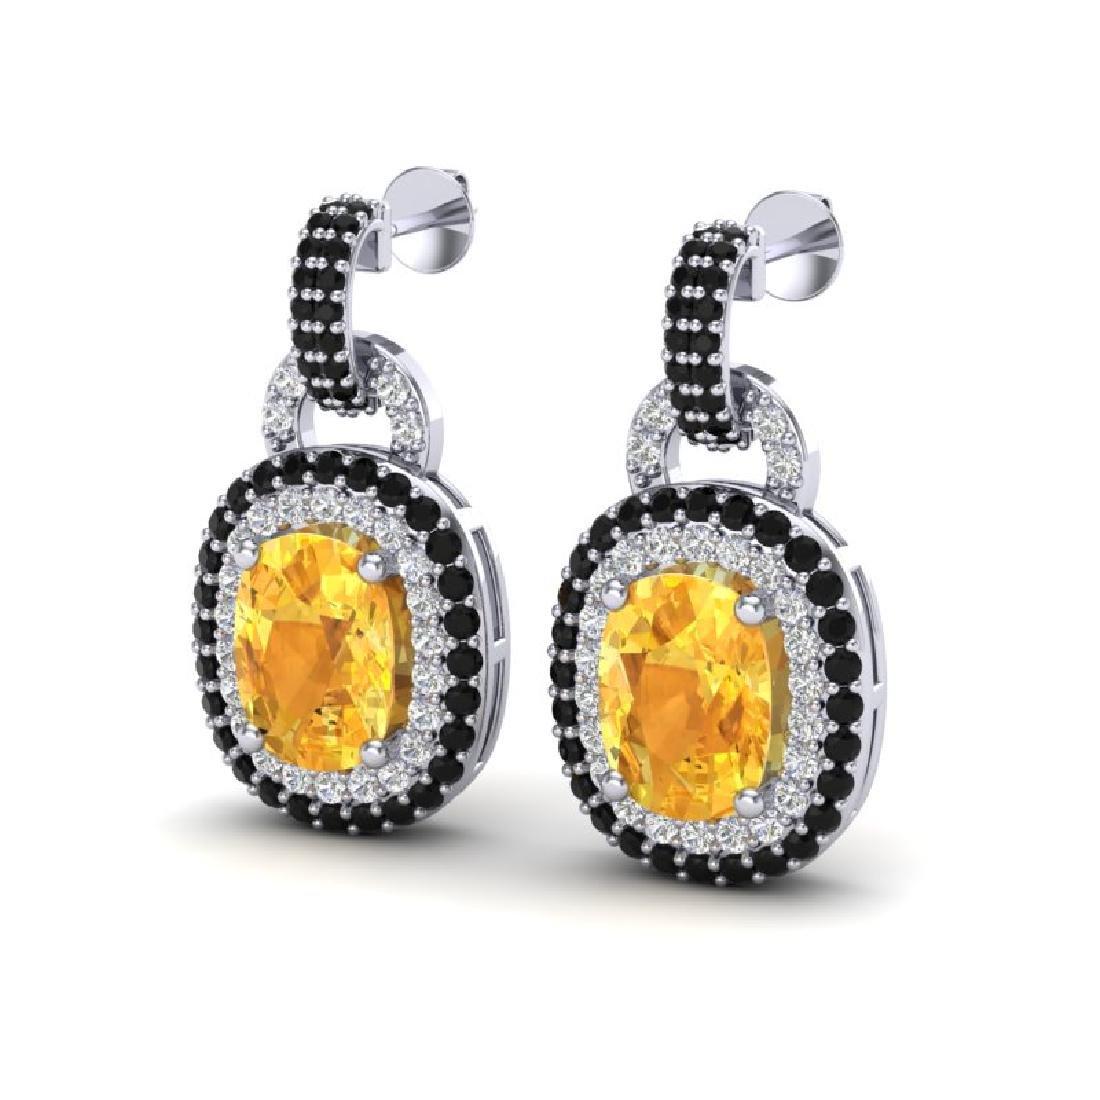 5 CTW Citrine With Black & Micro VS/SI Diamond Earrings